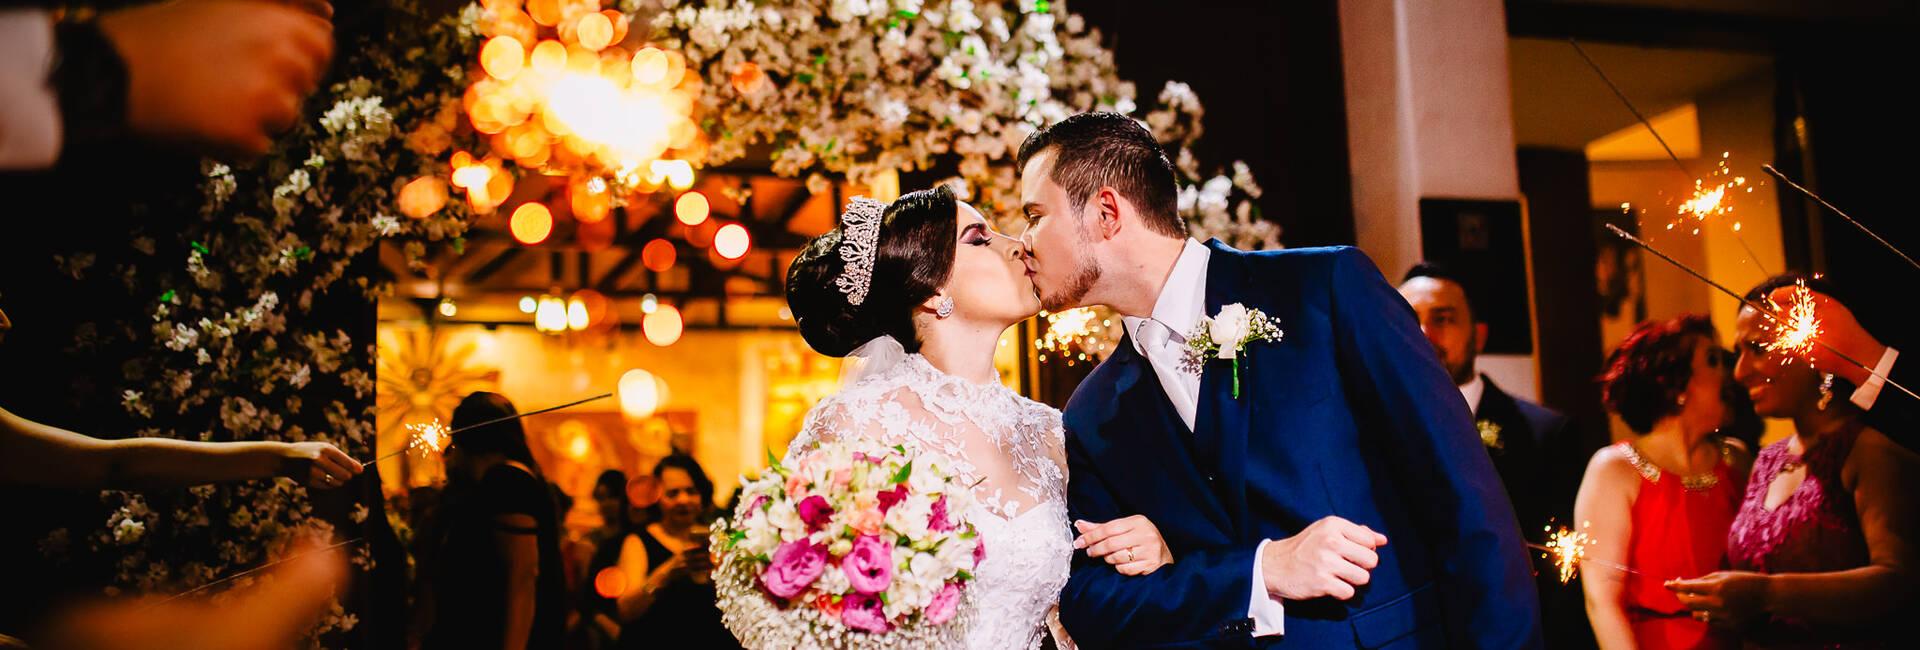 Casamento de Raquel e Thiago